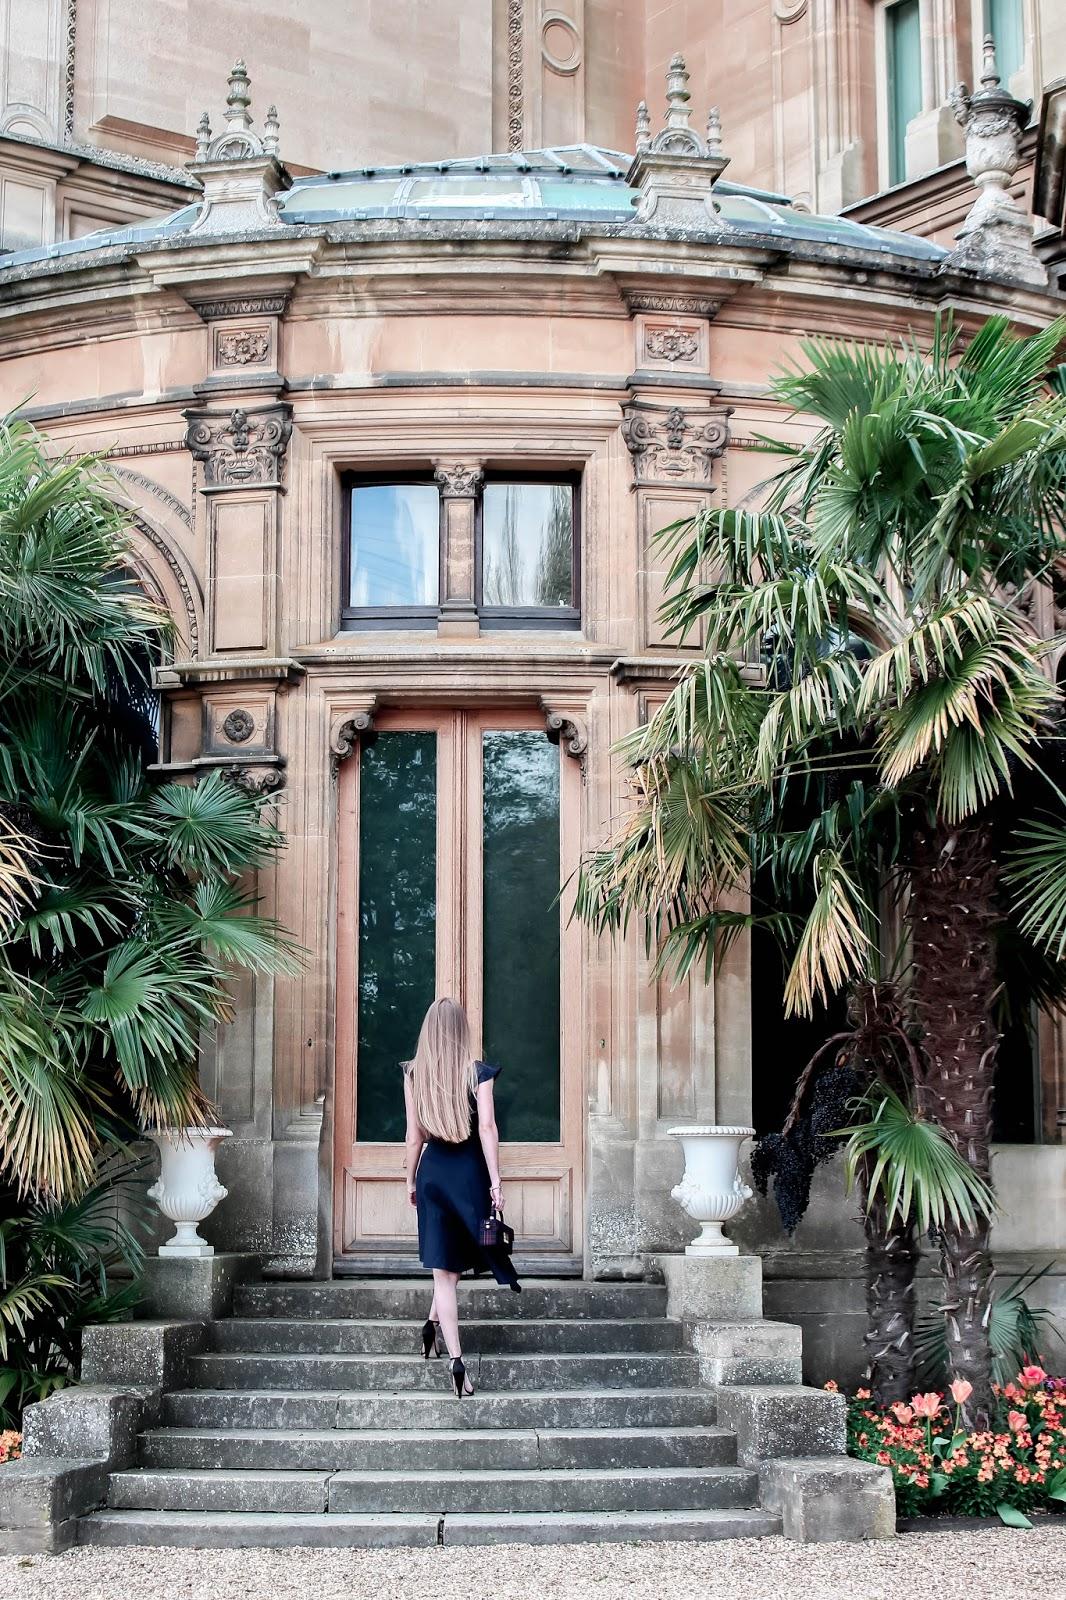 Photoshoot Elegant Dress Walking up to Grand Doors